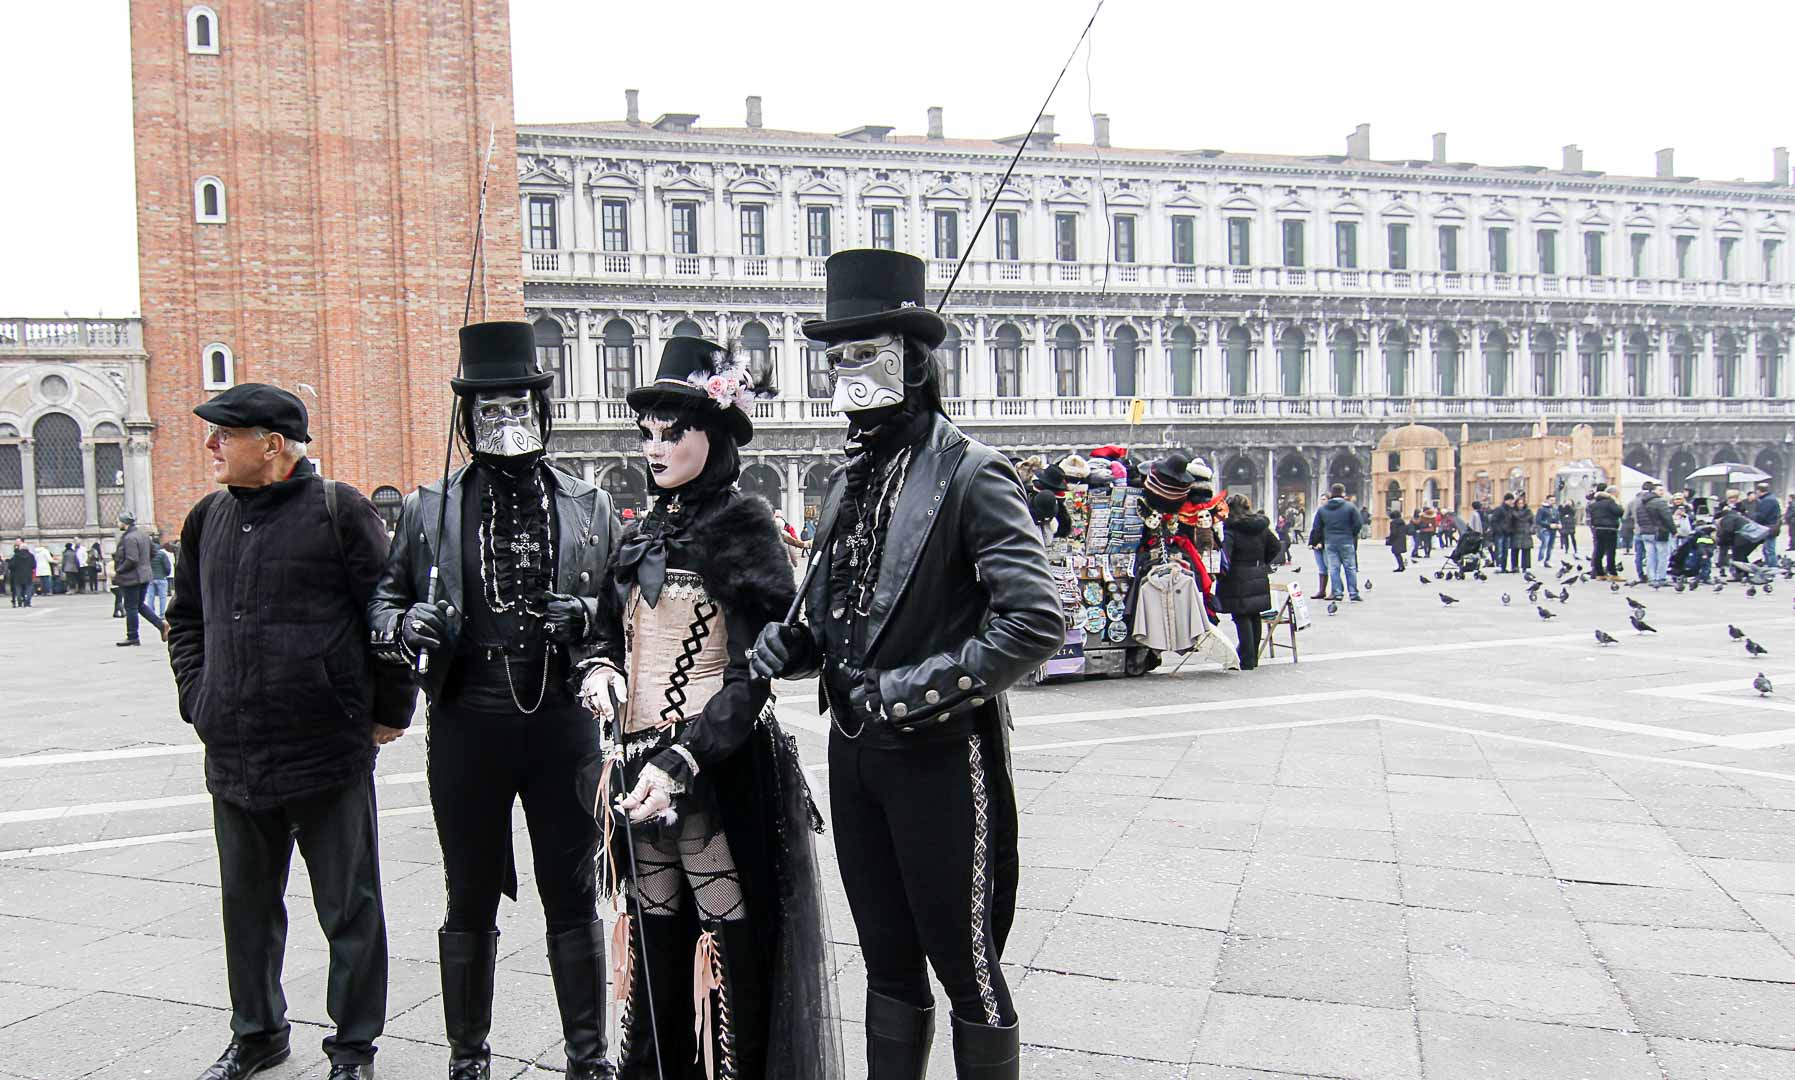 Venice-Carnival-Venedik-Karnaval-Bauta-San-Marco